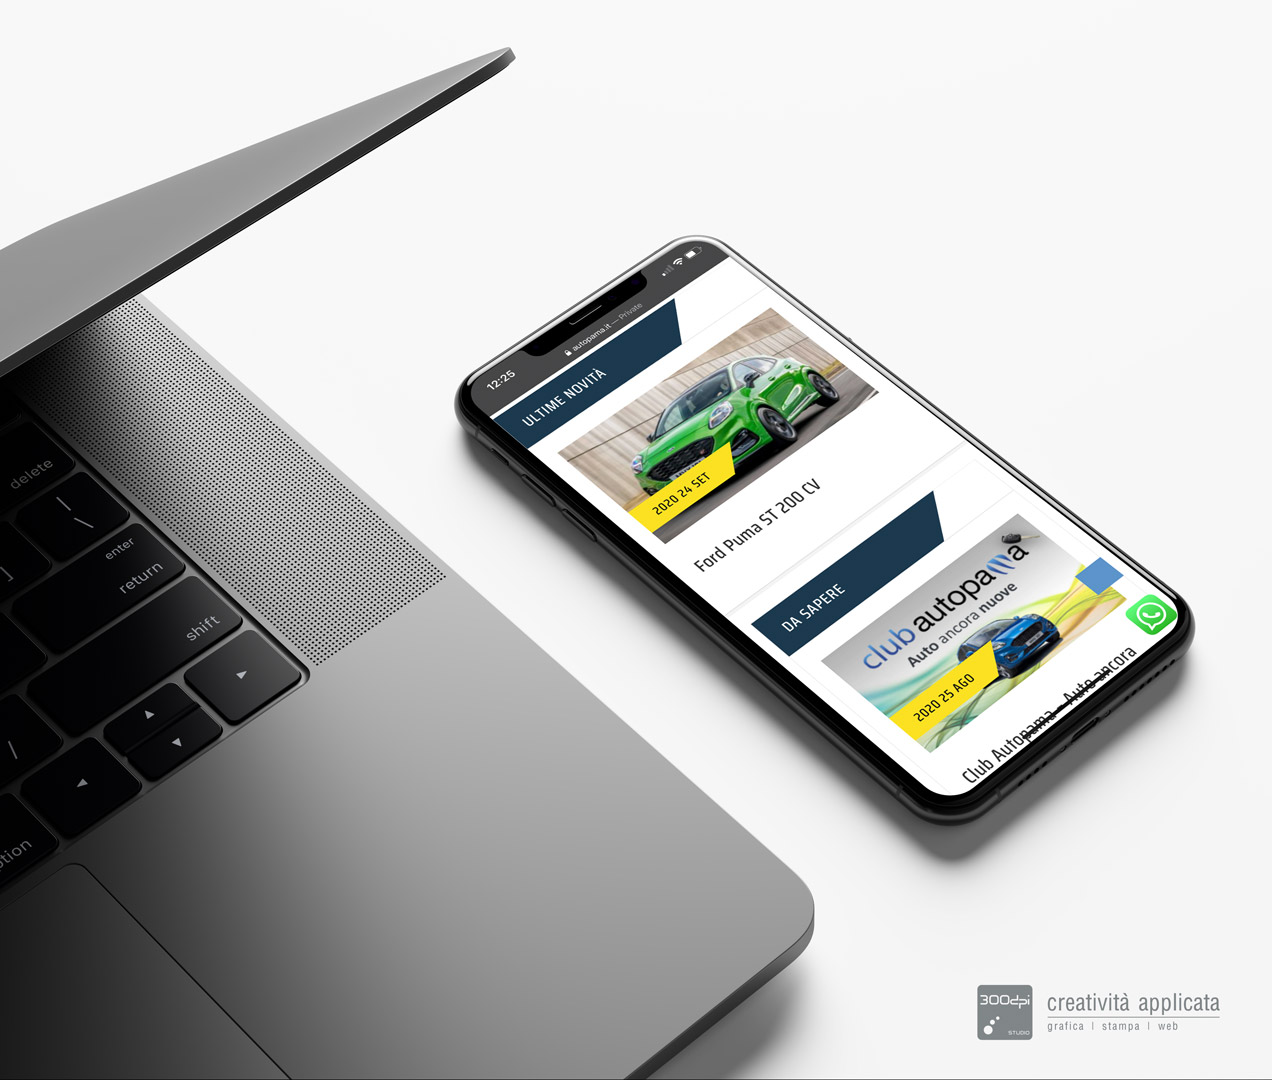 Siti internet per cellulare - Autopama FORD UMBRIA